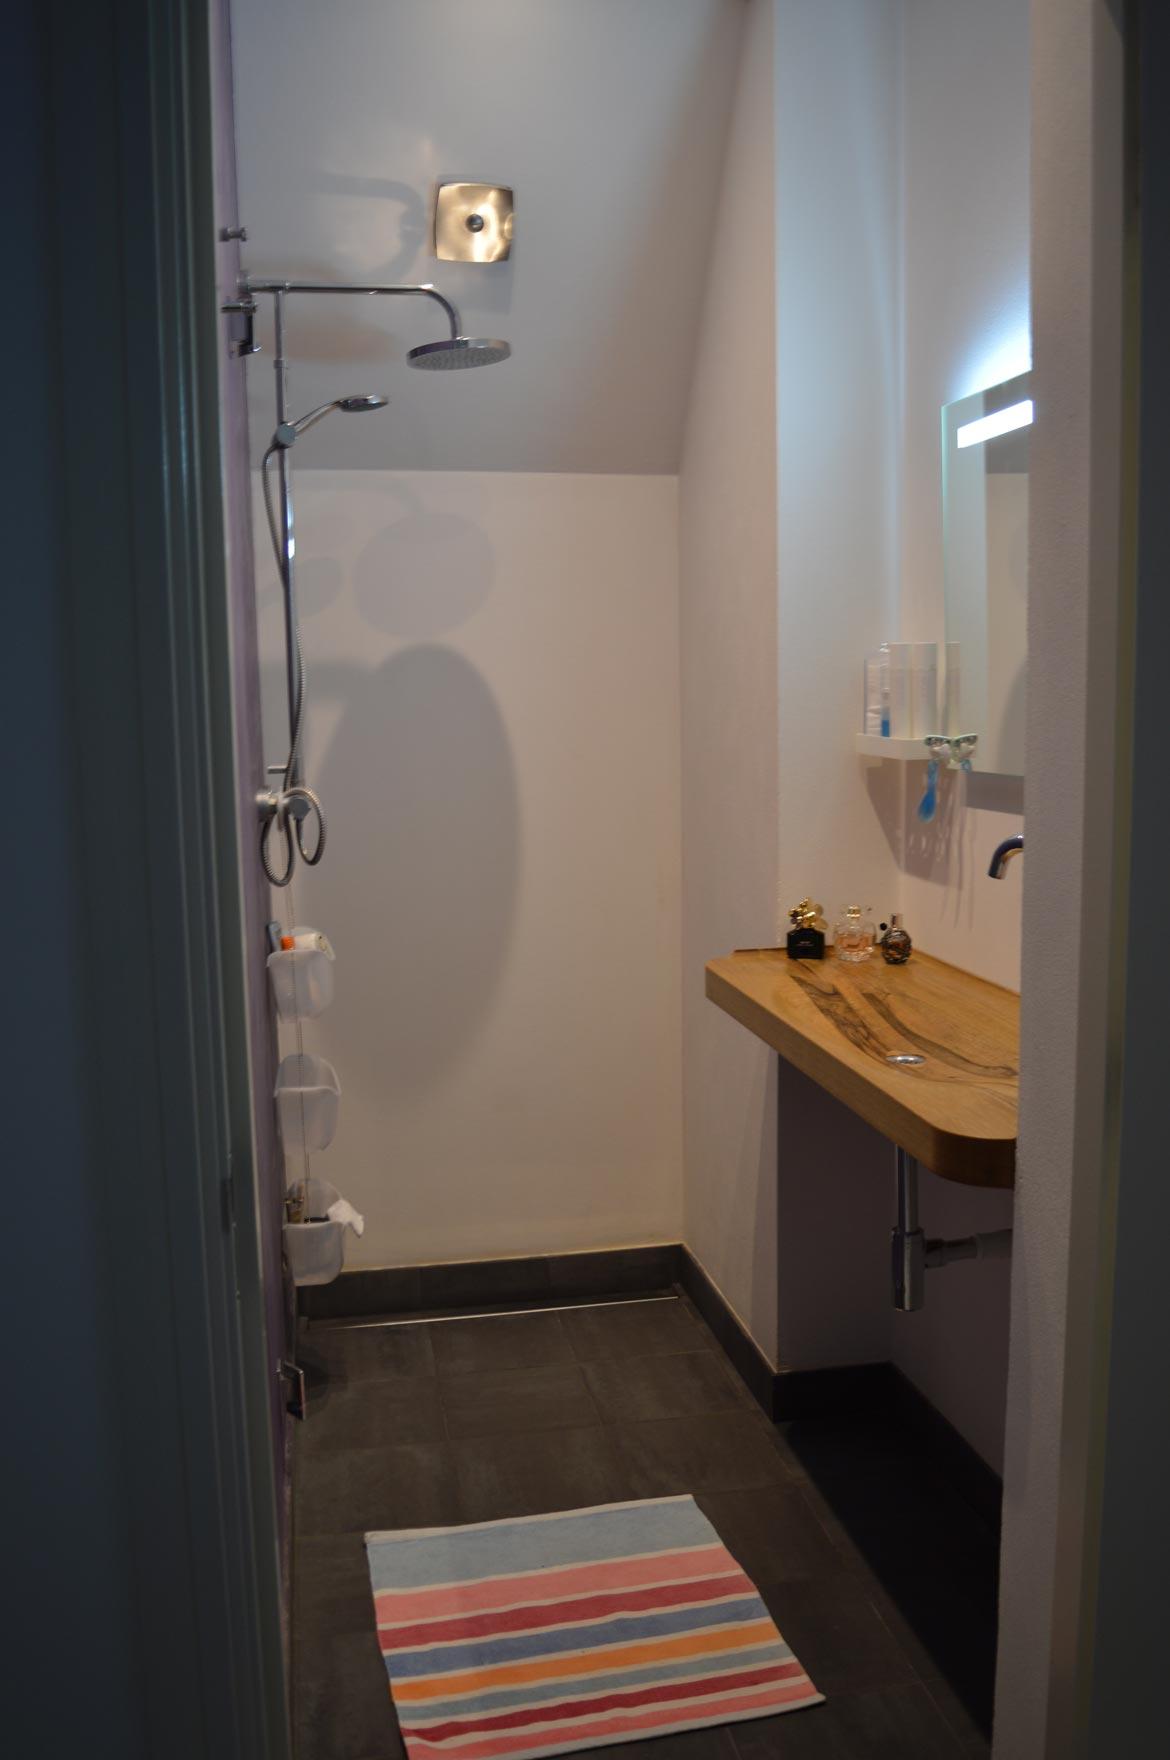 20170402&124825_Kleine Nieuwe Badkamer ~ Kleine badkamer na plaatsen houten wastafel